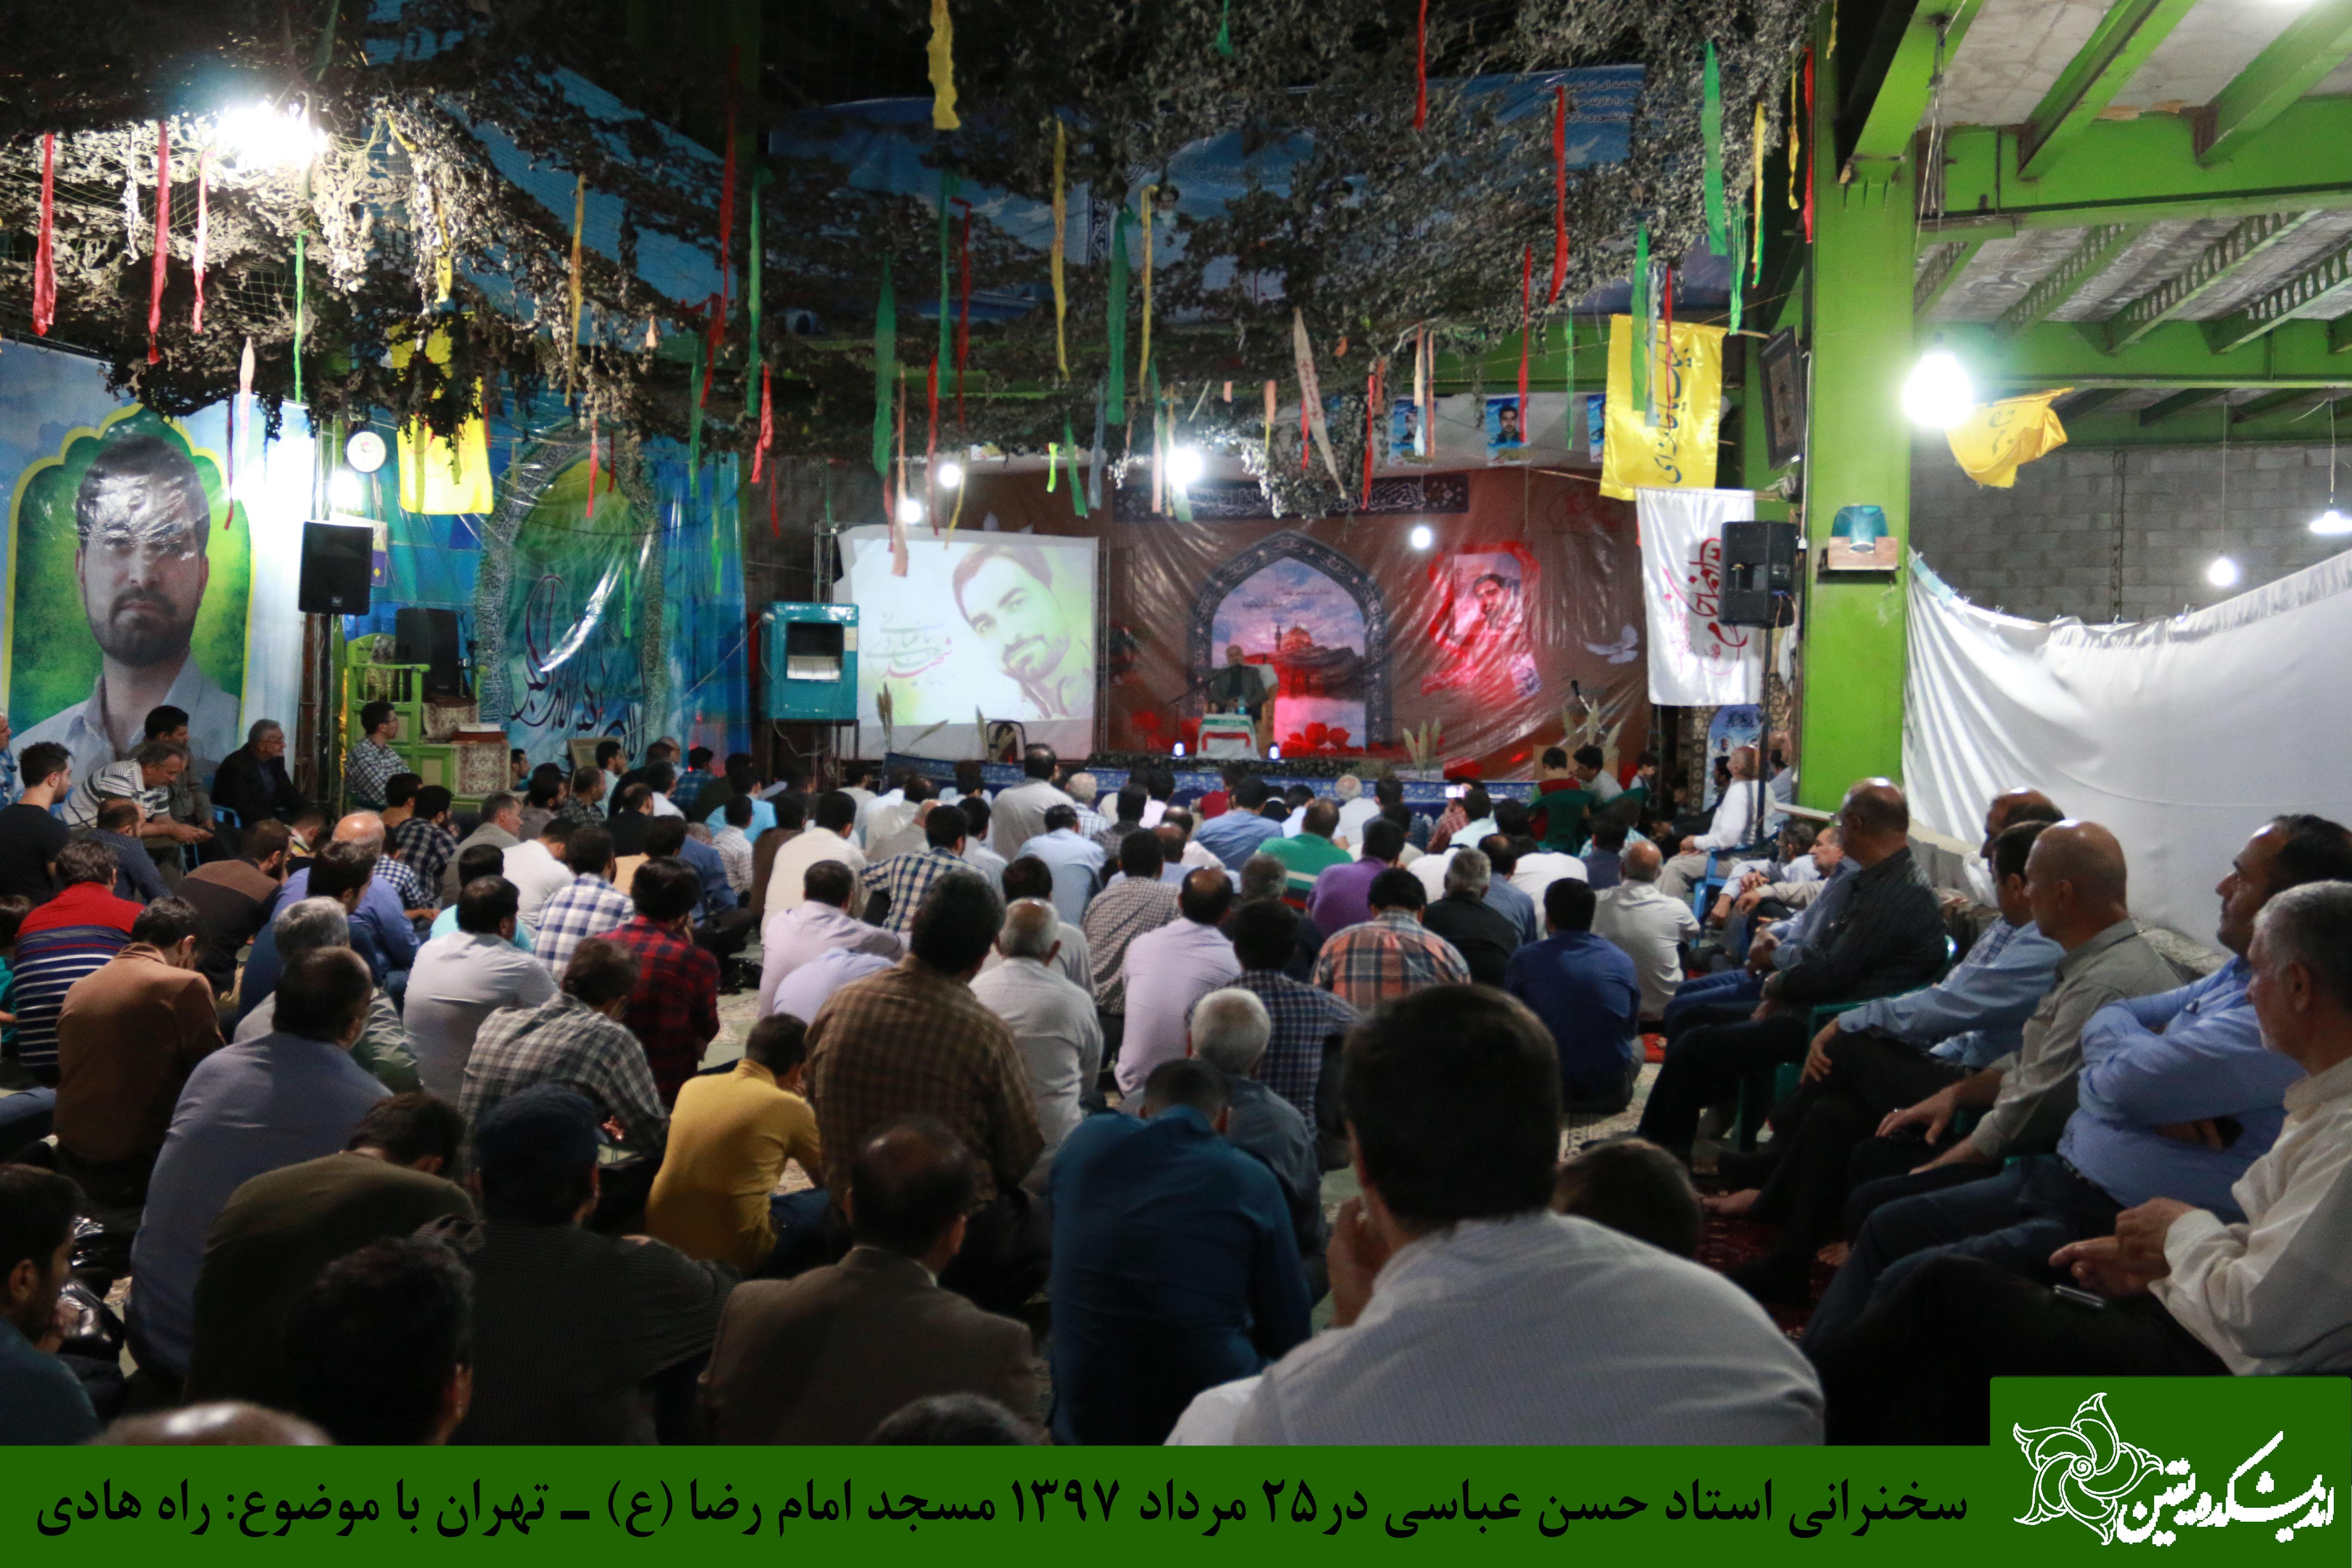 IMG 970525%20%281%29 نقل از تصویری؛ سخنرانی استاد حسن عباسی با موضوع راه هادی